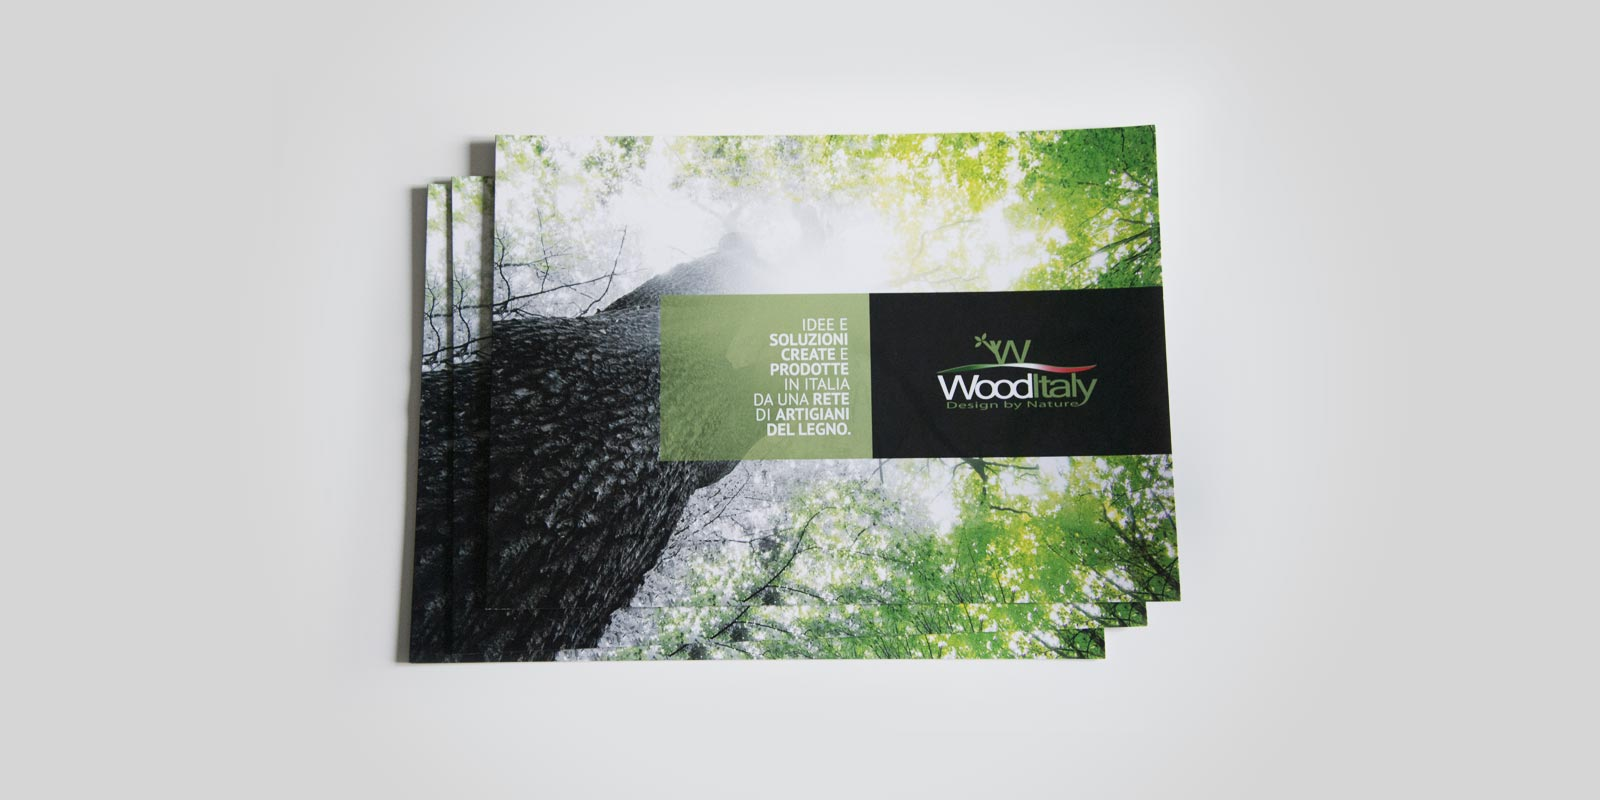 Wooditaly